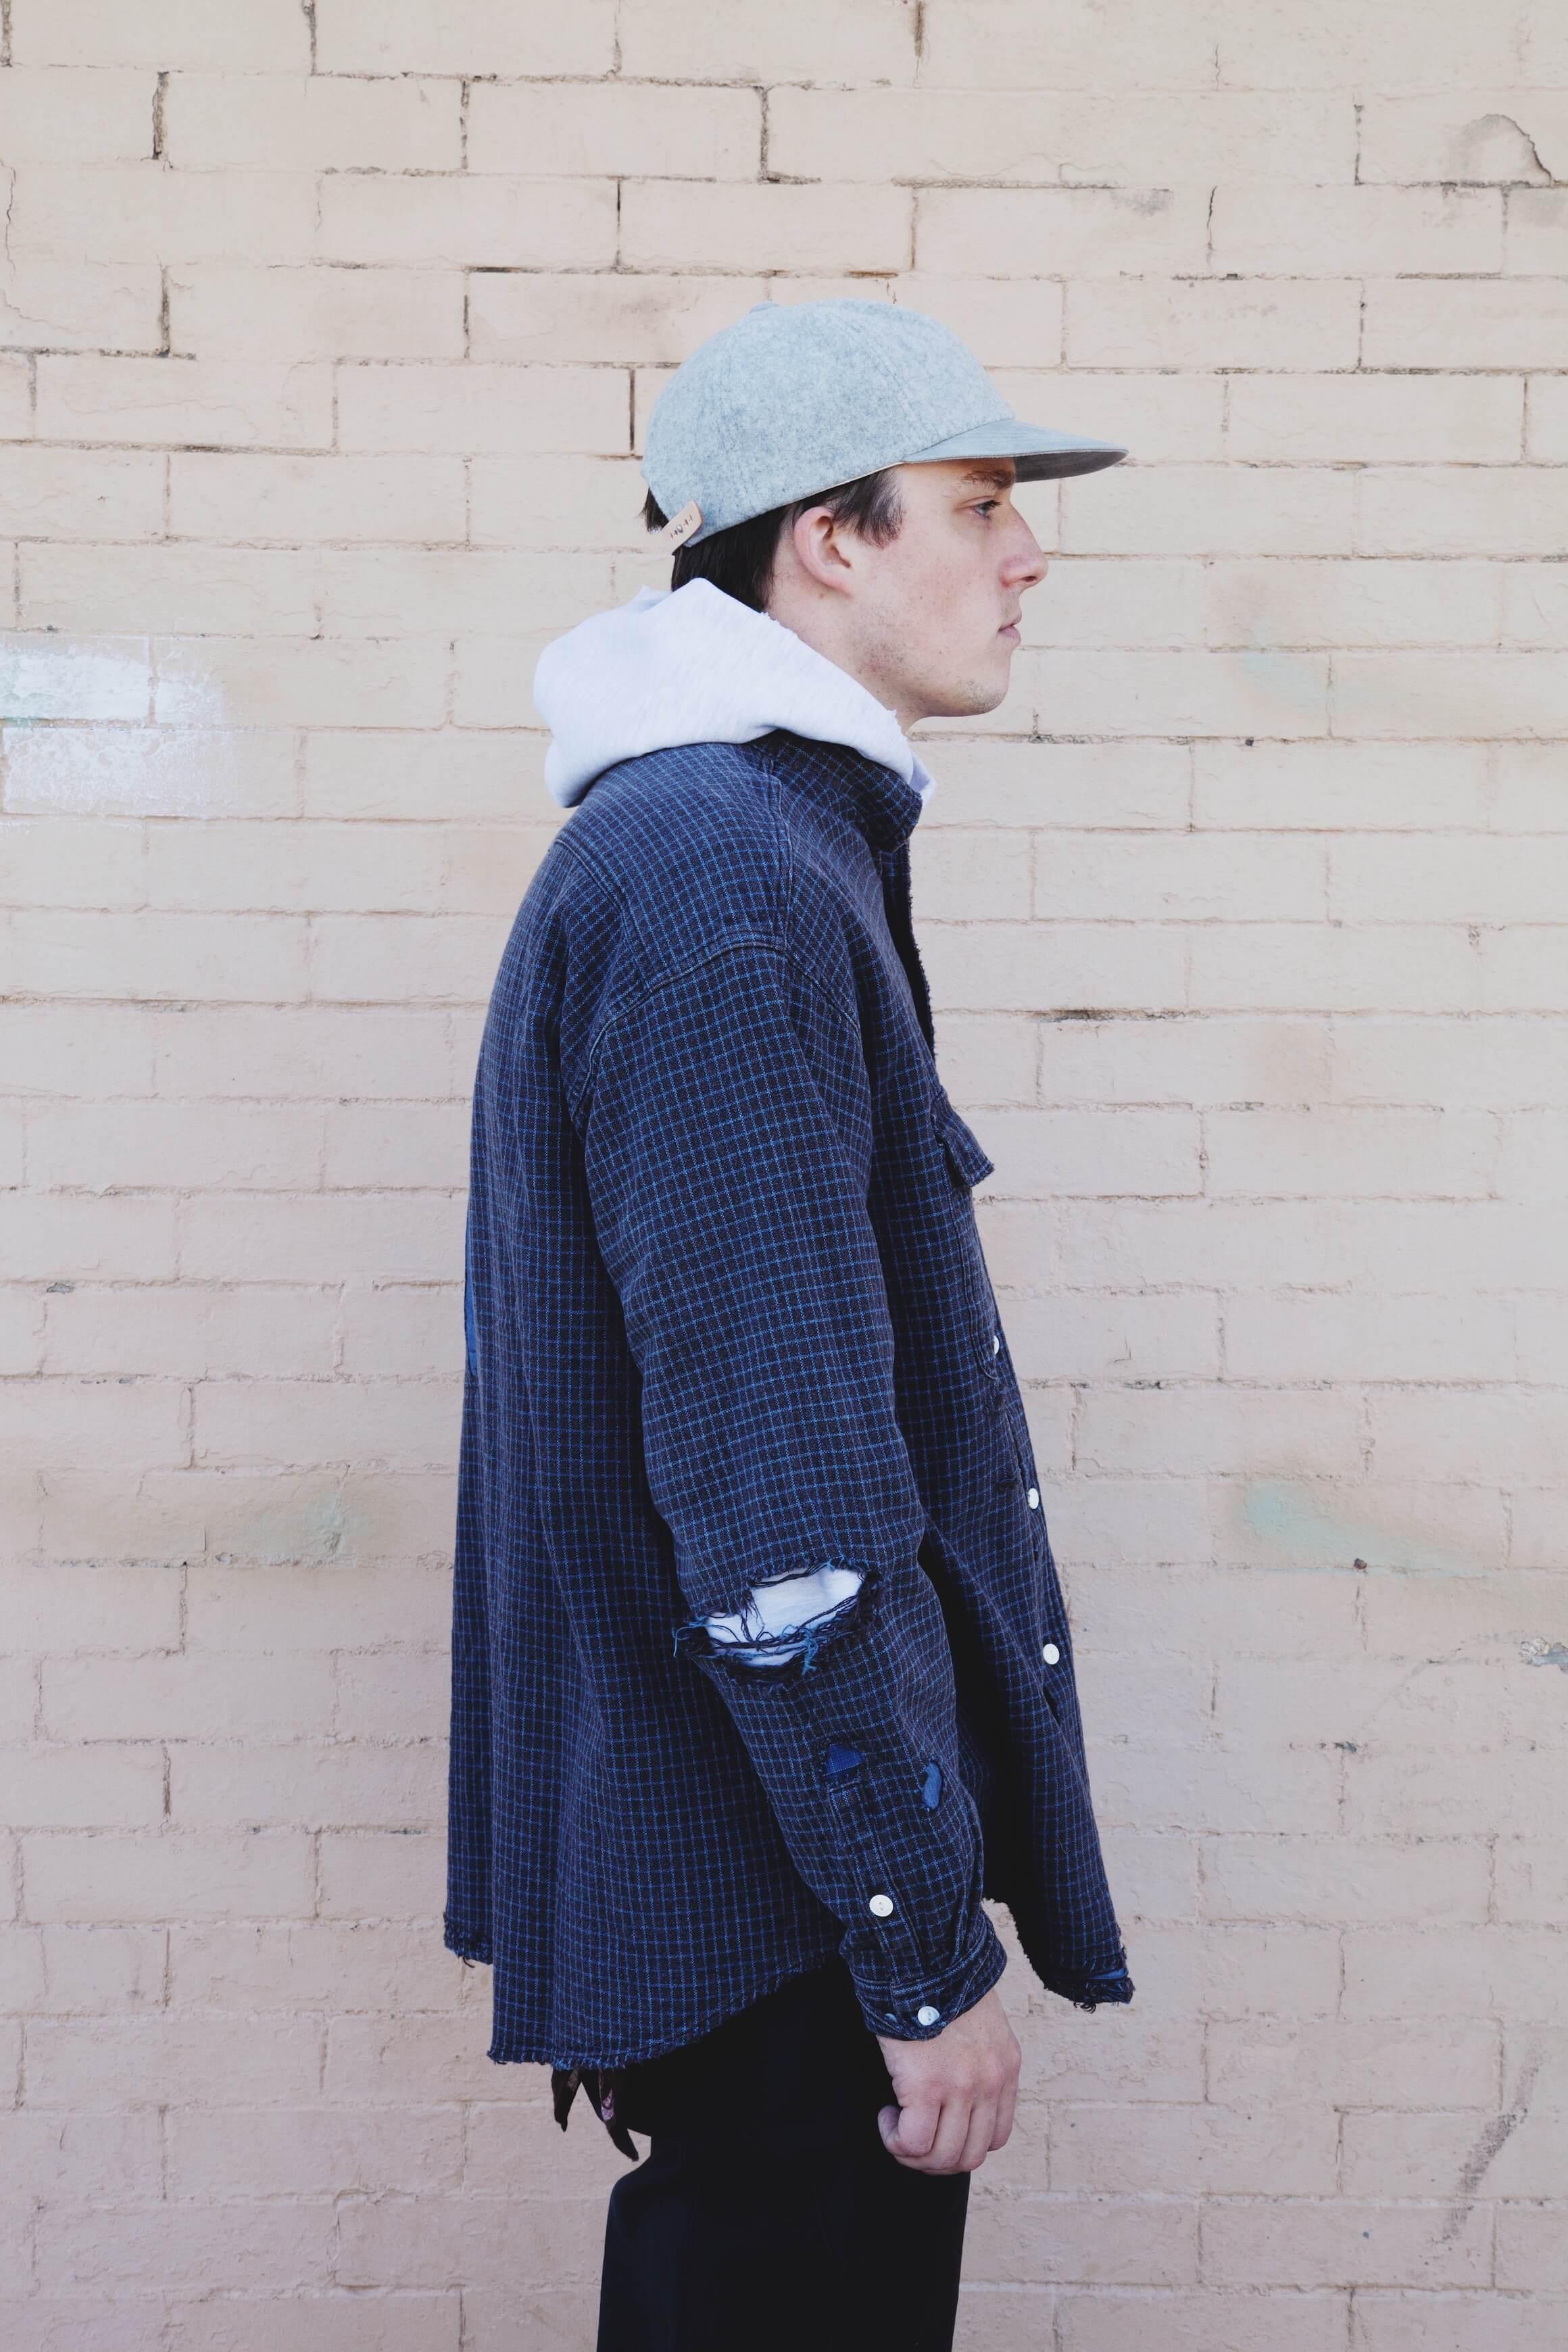 3 ways to style hooded sweatshirts featuring canoe club hoodie